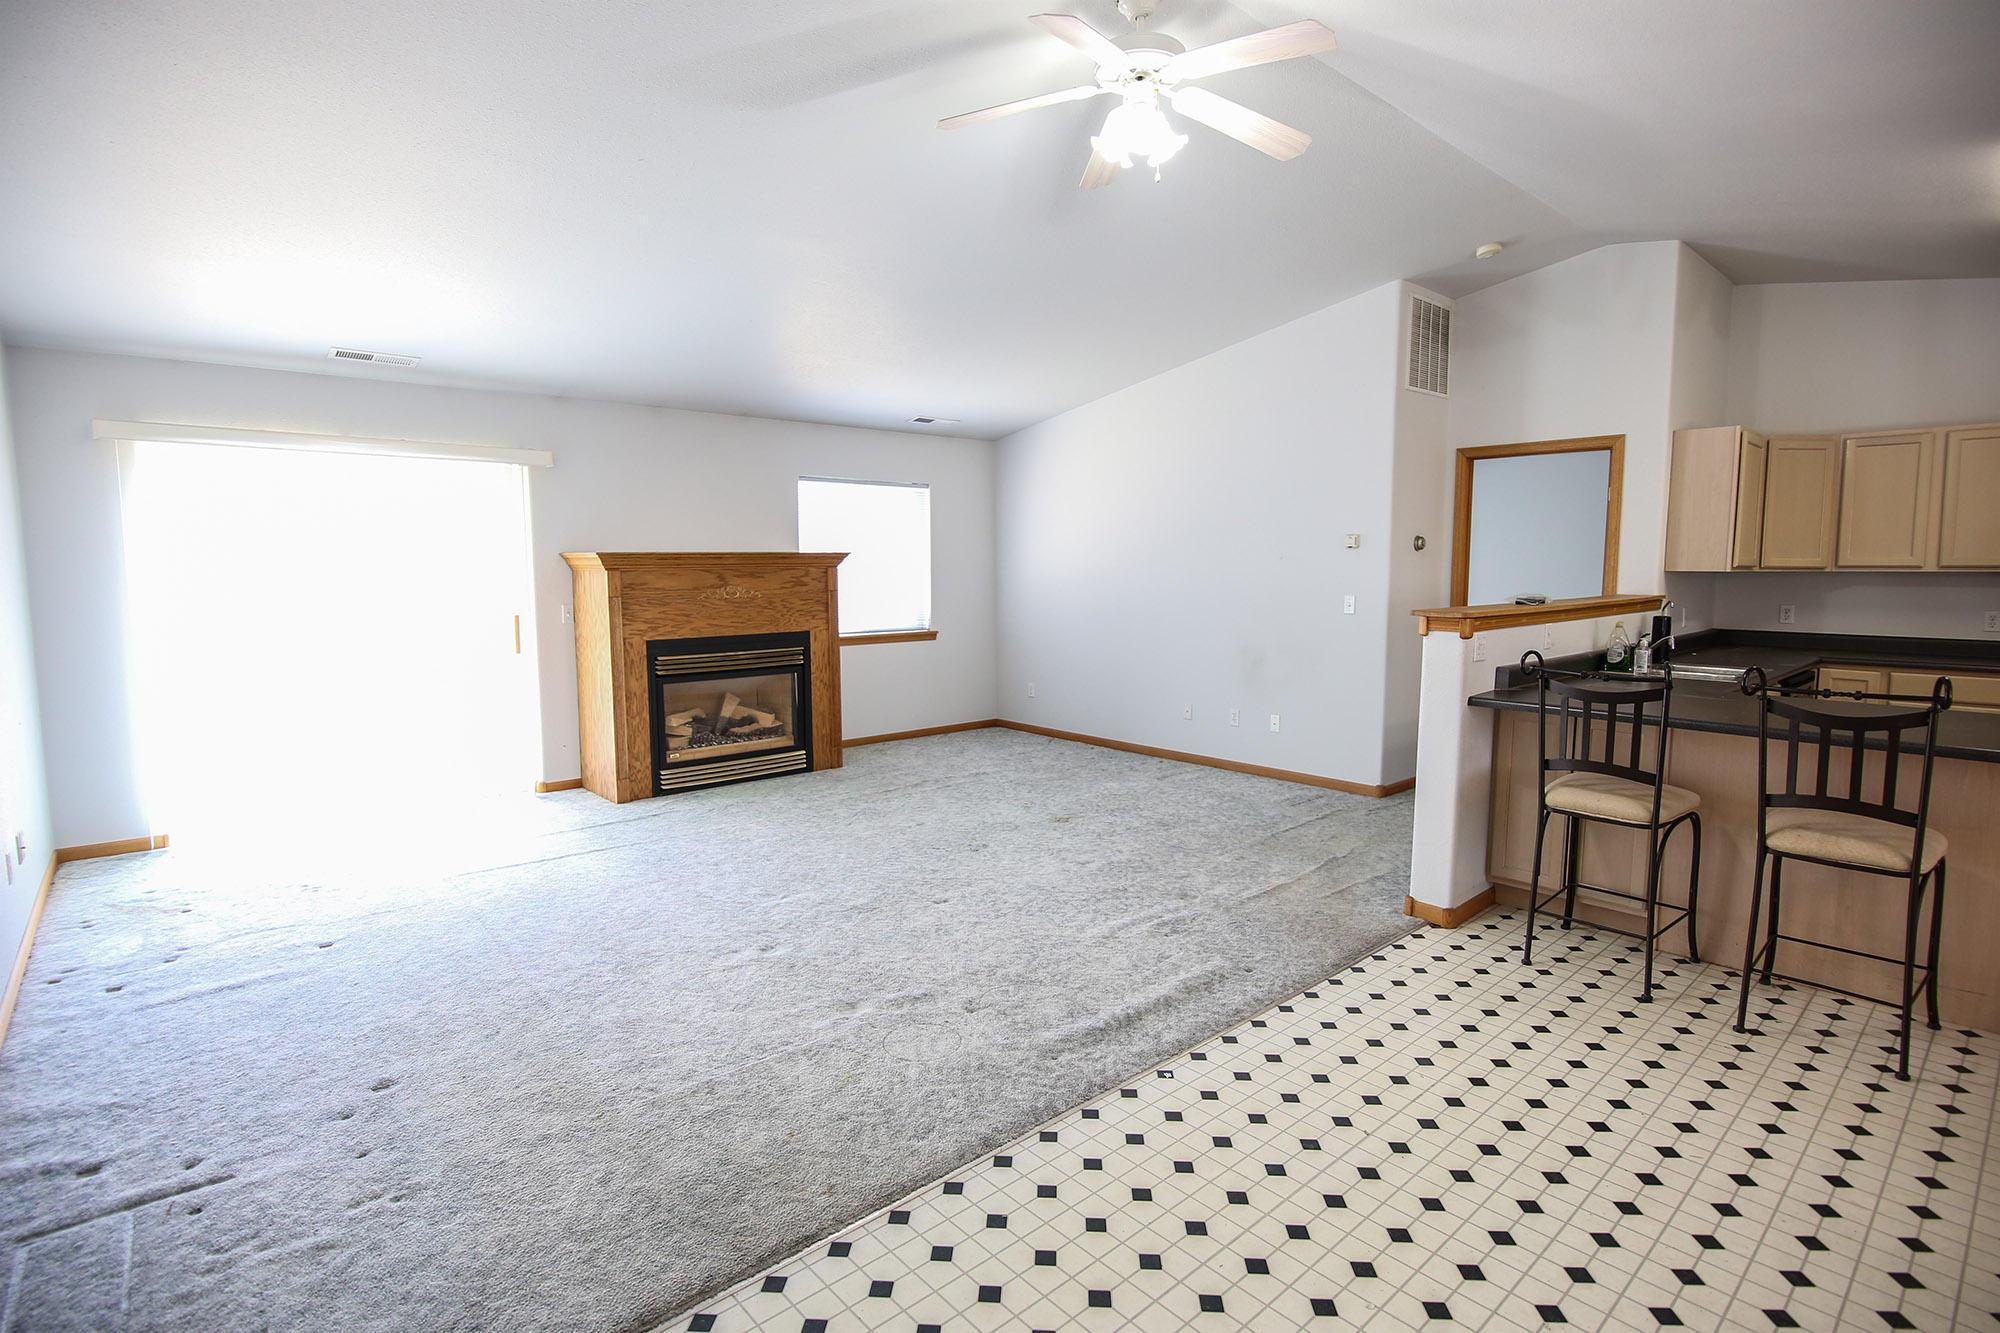 1361 Thomas Drive, Sheridan, Wyoming 82801, 3 Bedrooms Bedrooms, ,2 BathroomsBathrooms,Residential,For Sale,Thomas,19-286